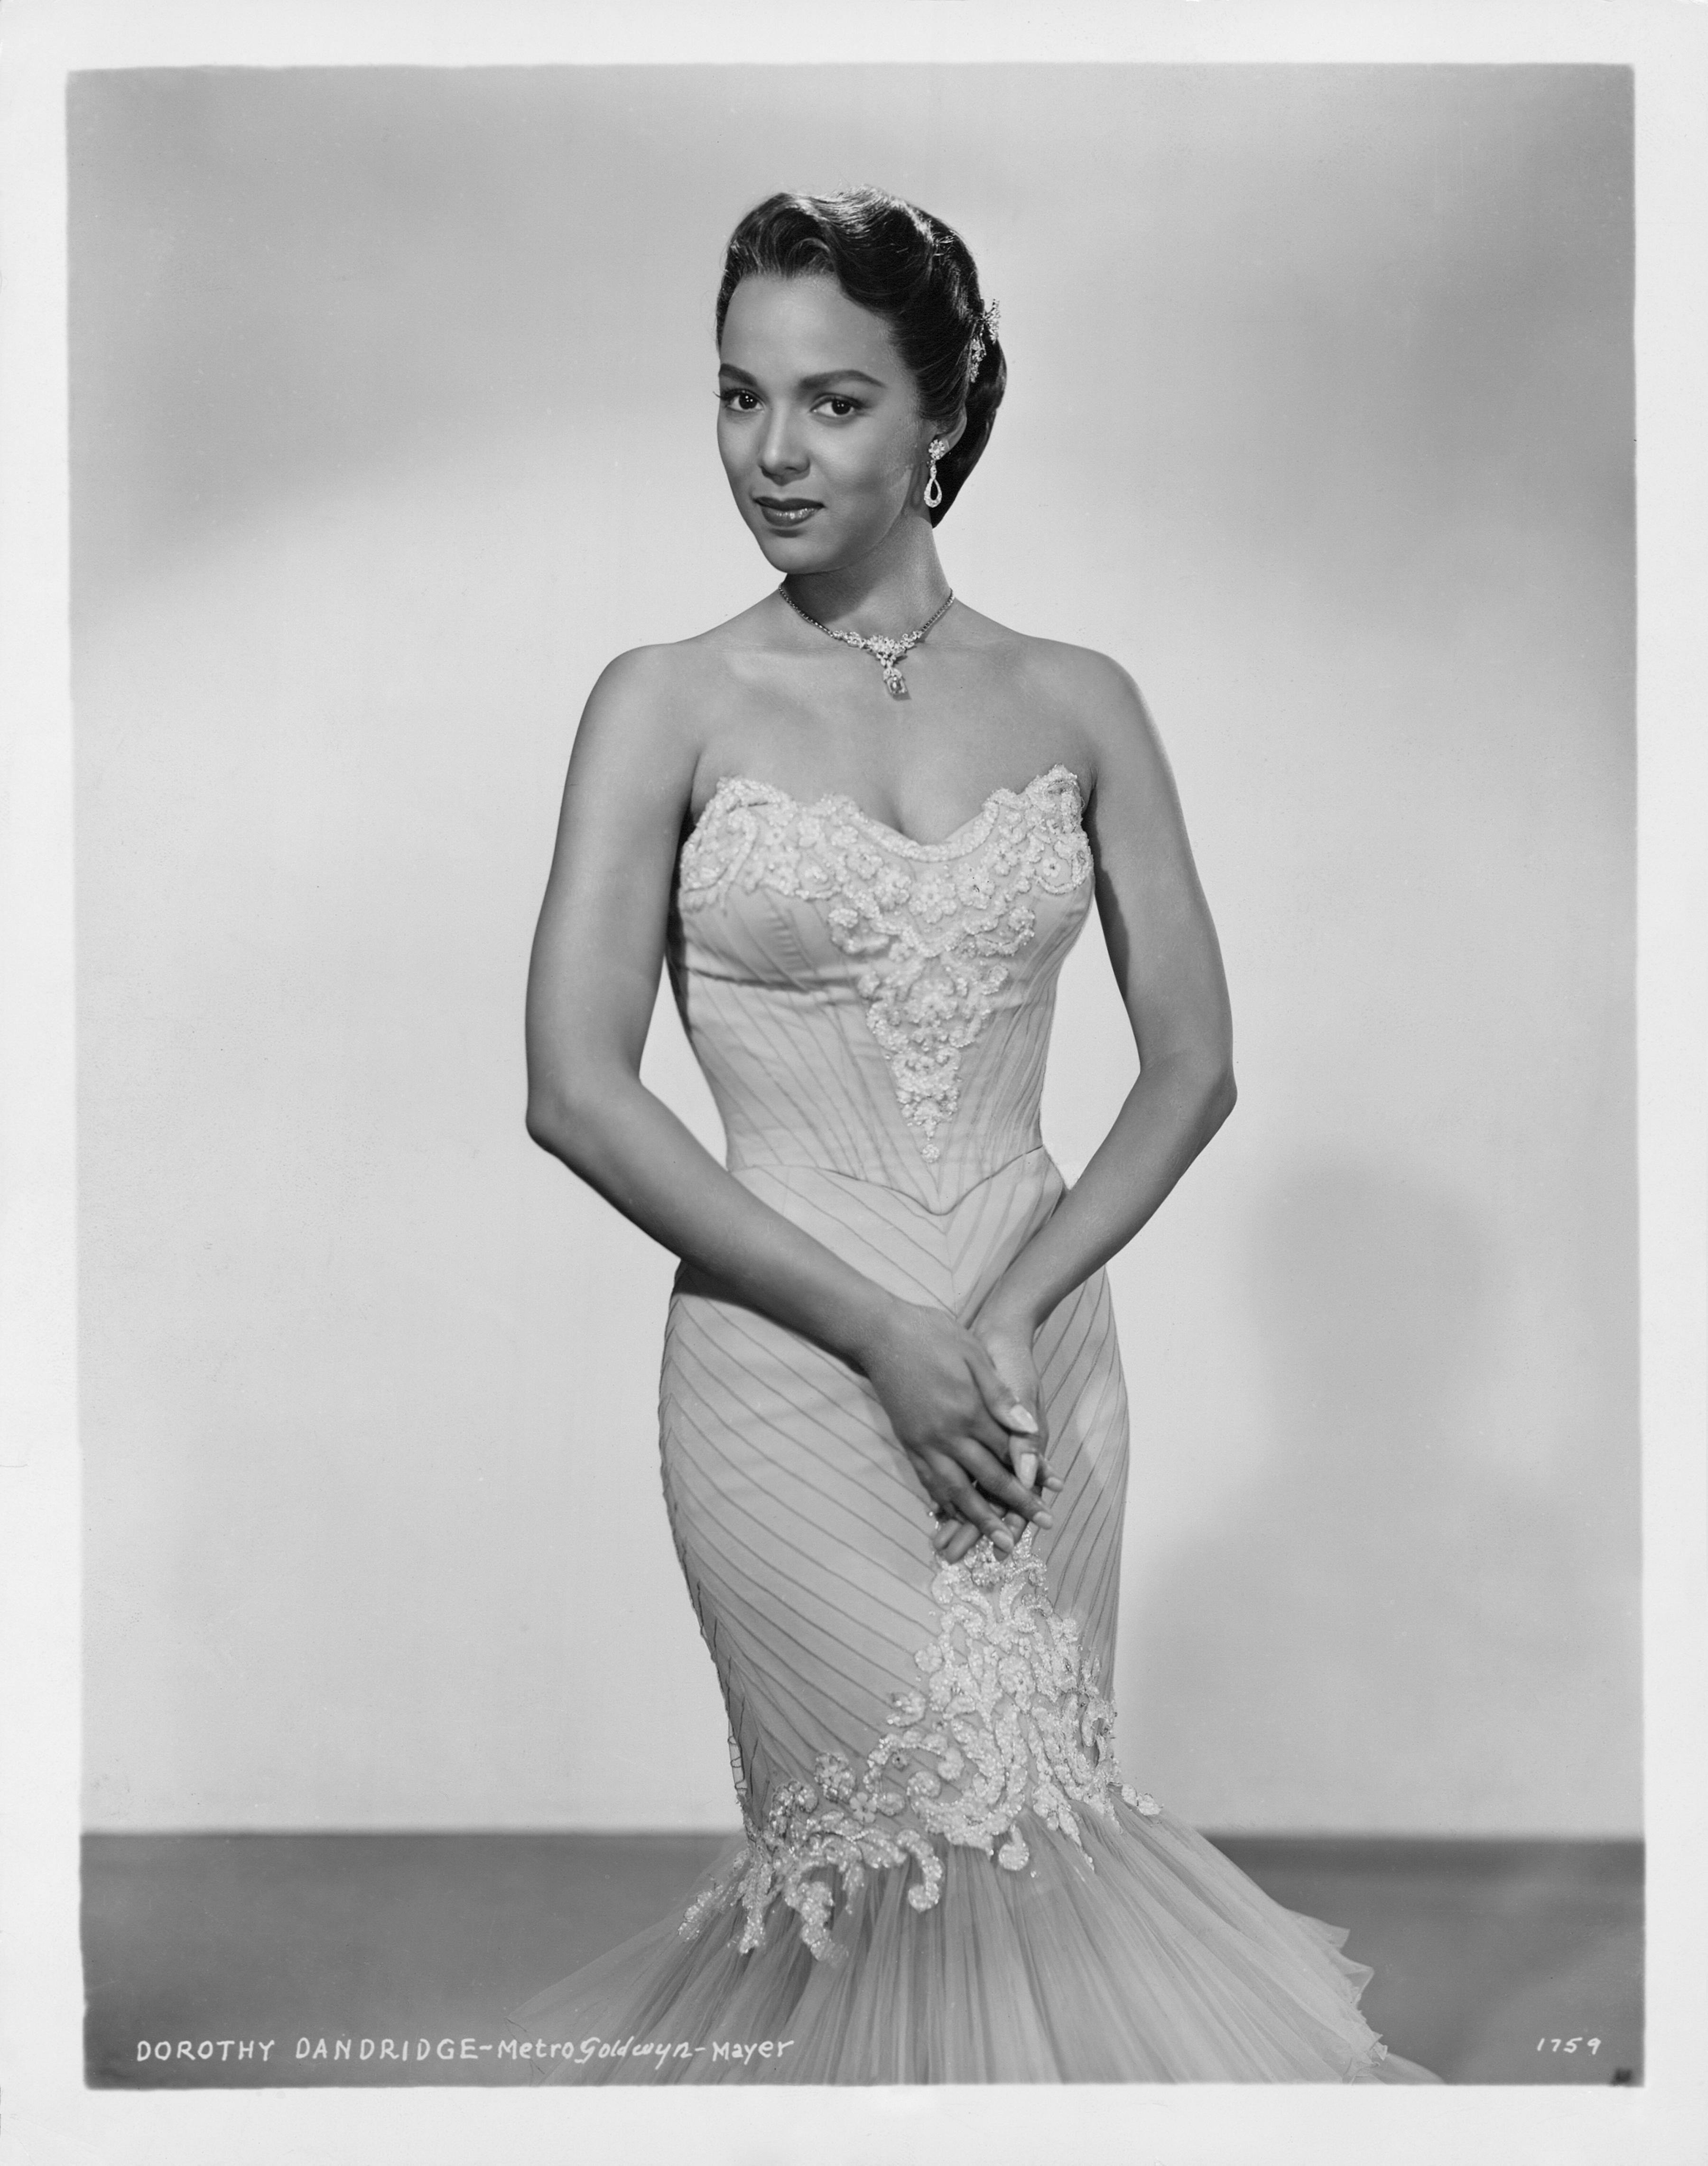 vintage photos Dorothy Dandridge